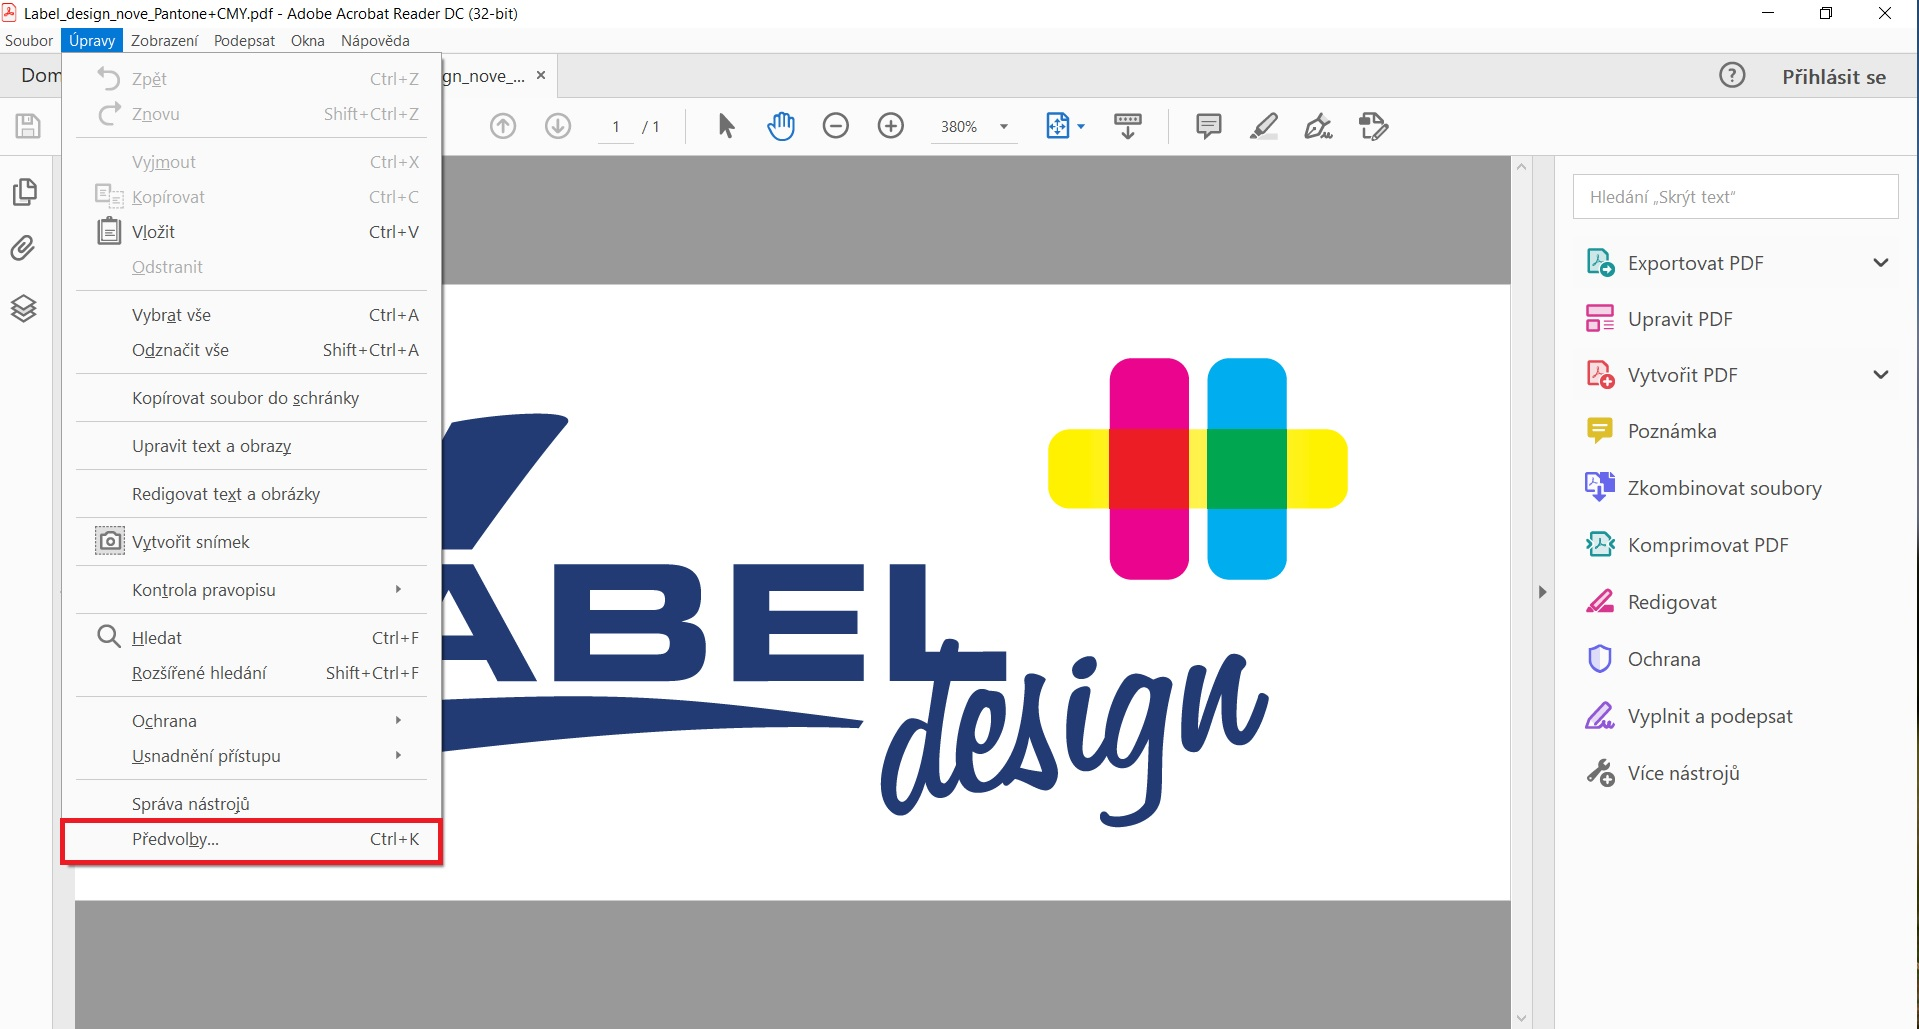 náhled přetisku 1 label design